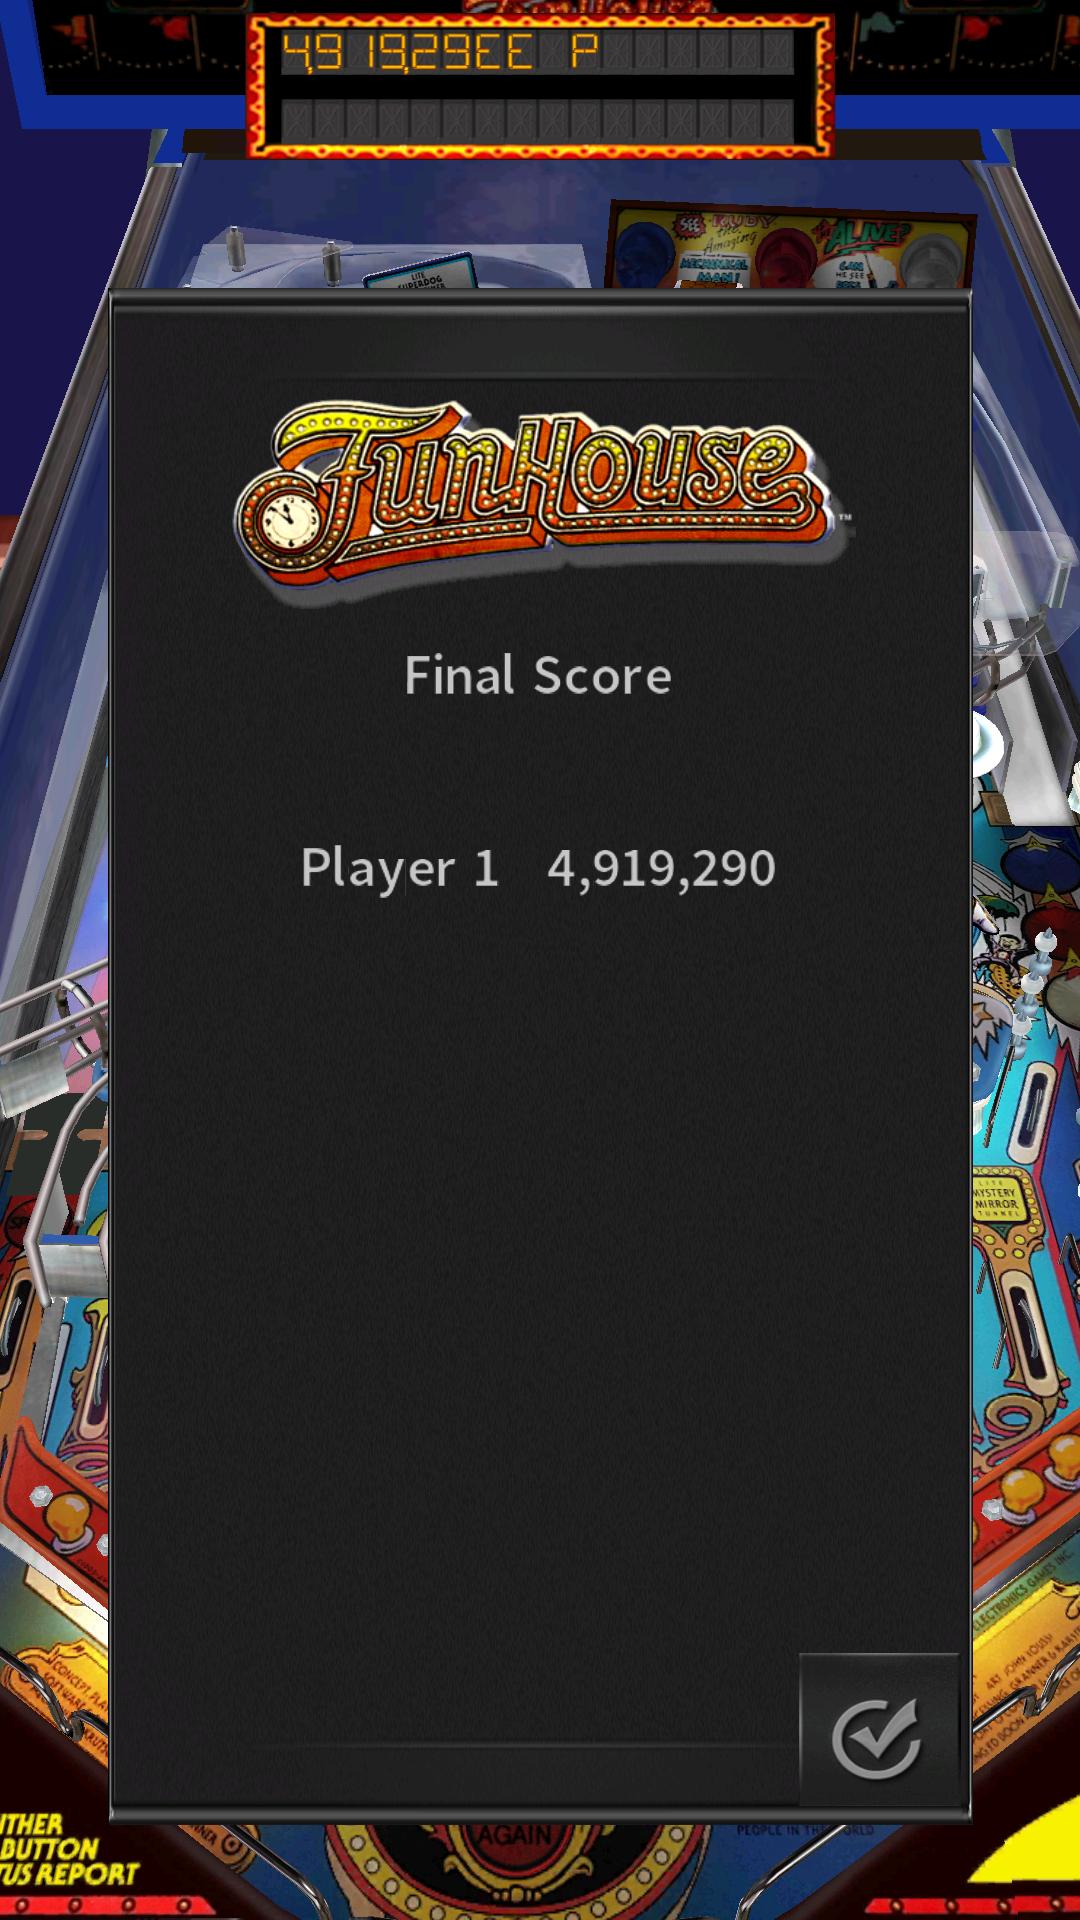 Pinball Arcade: Funhouse 4,919,290 points